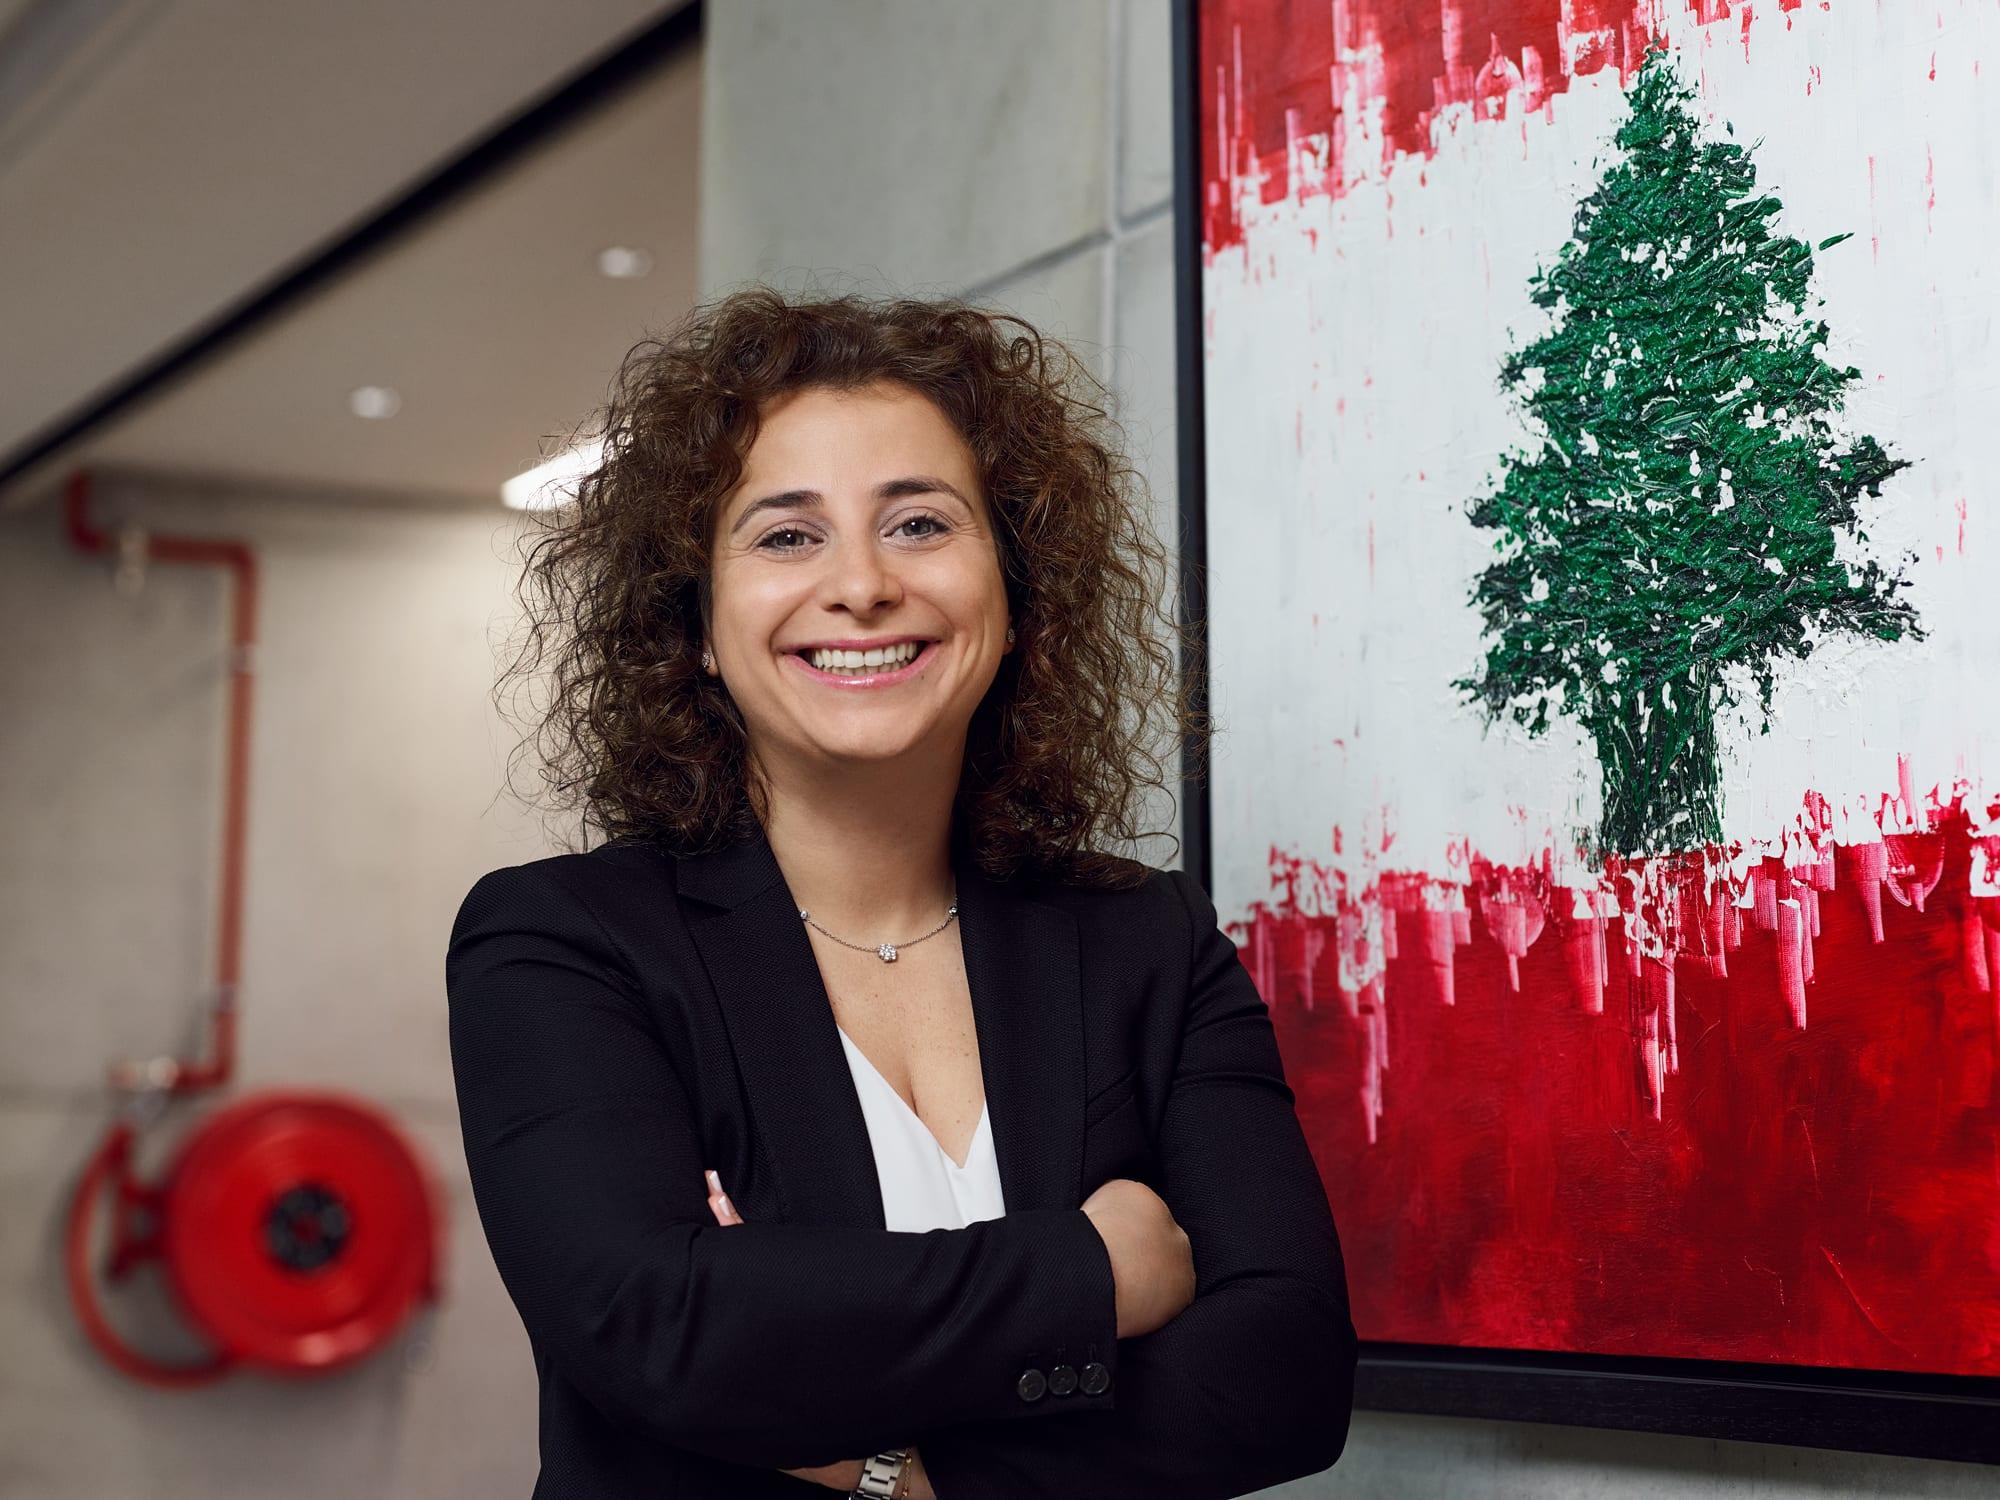 PERI – Lebanon